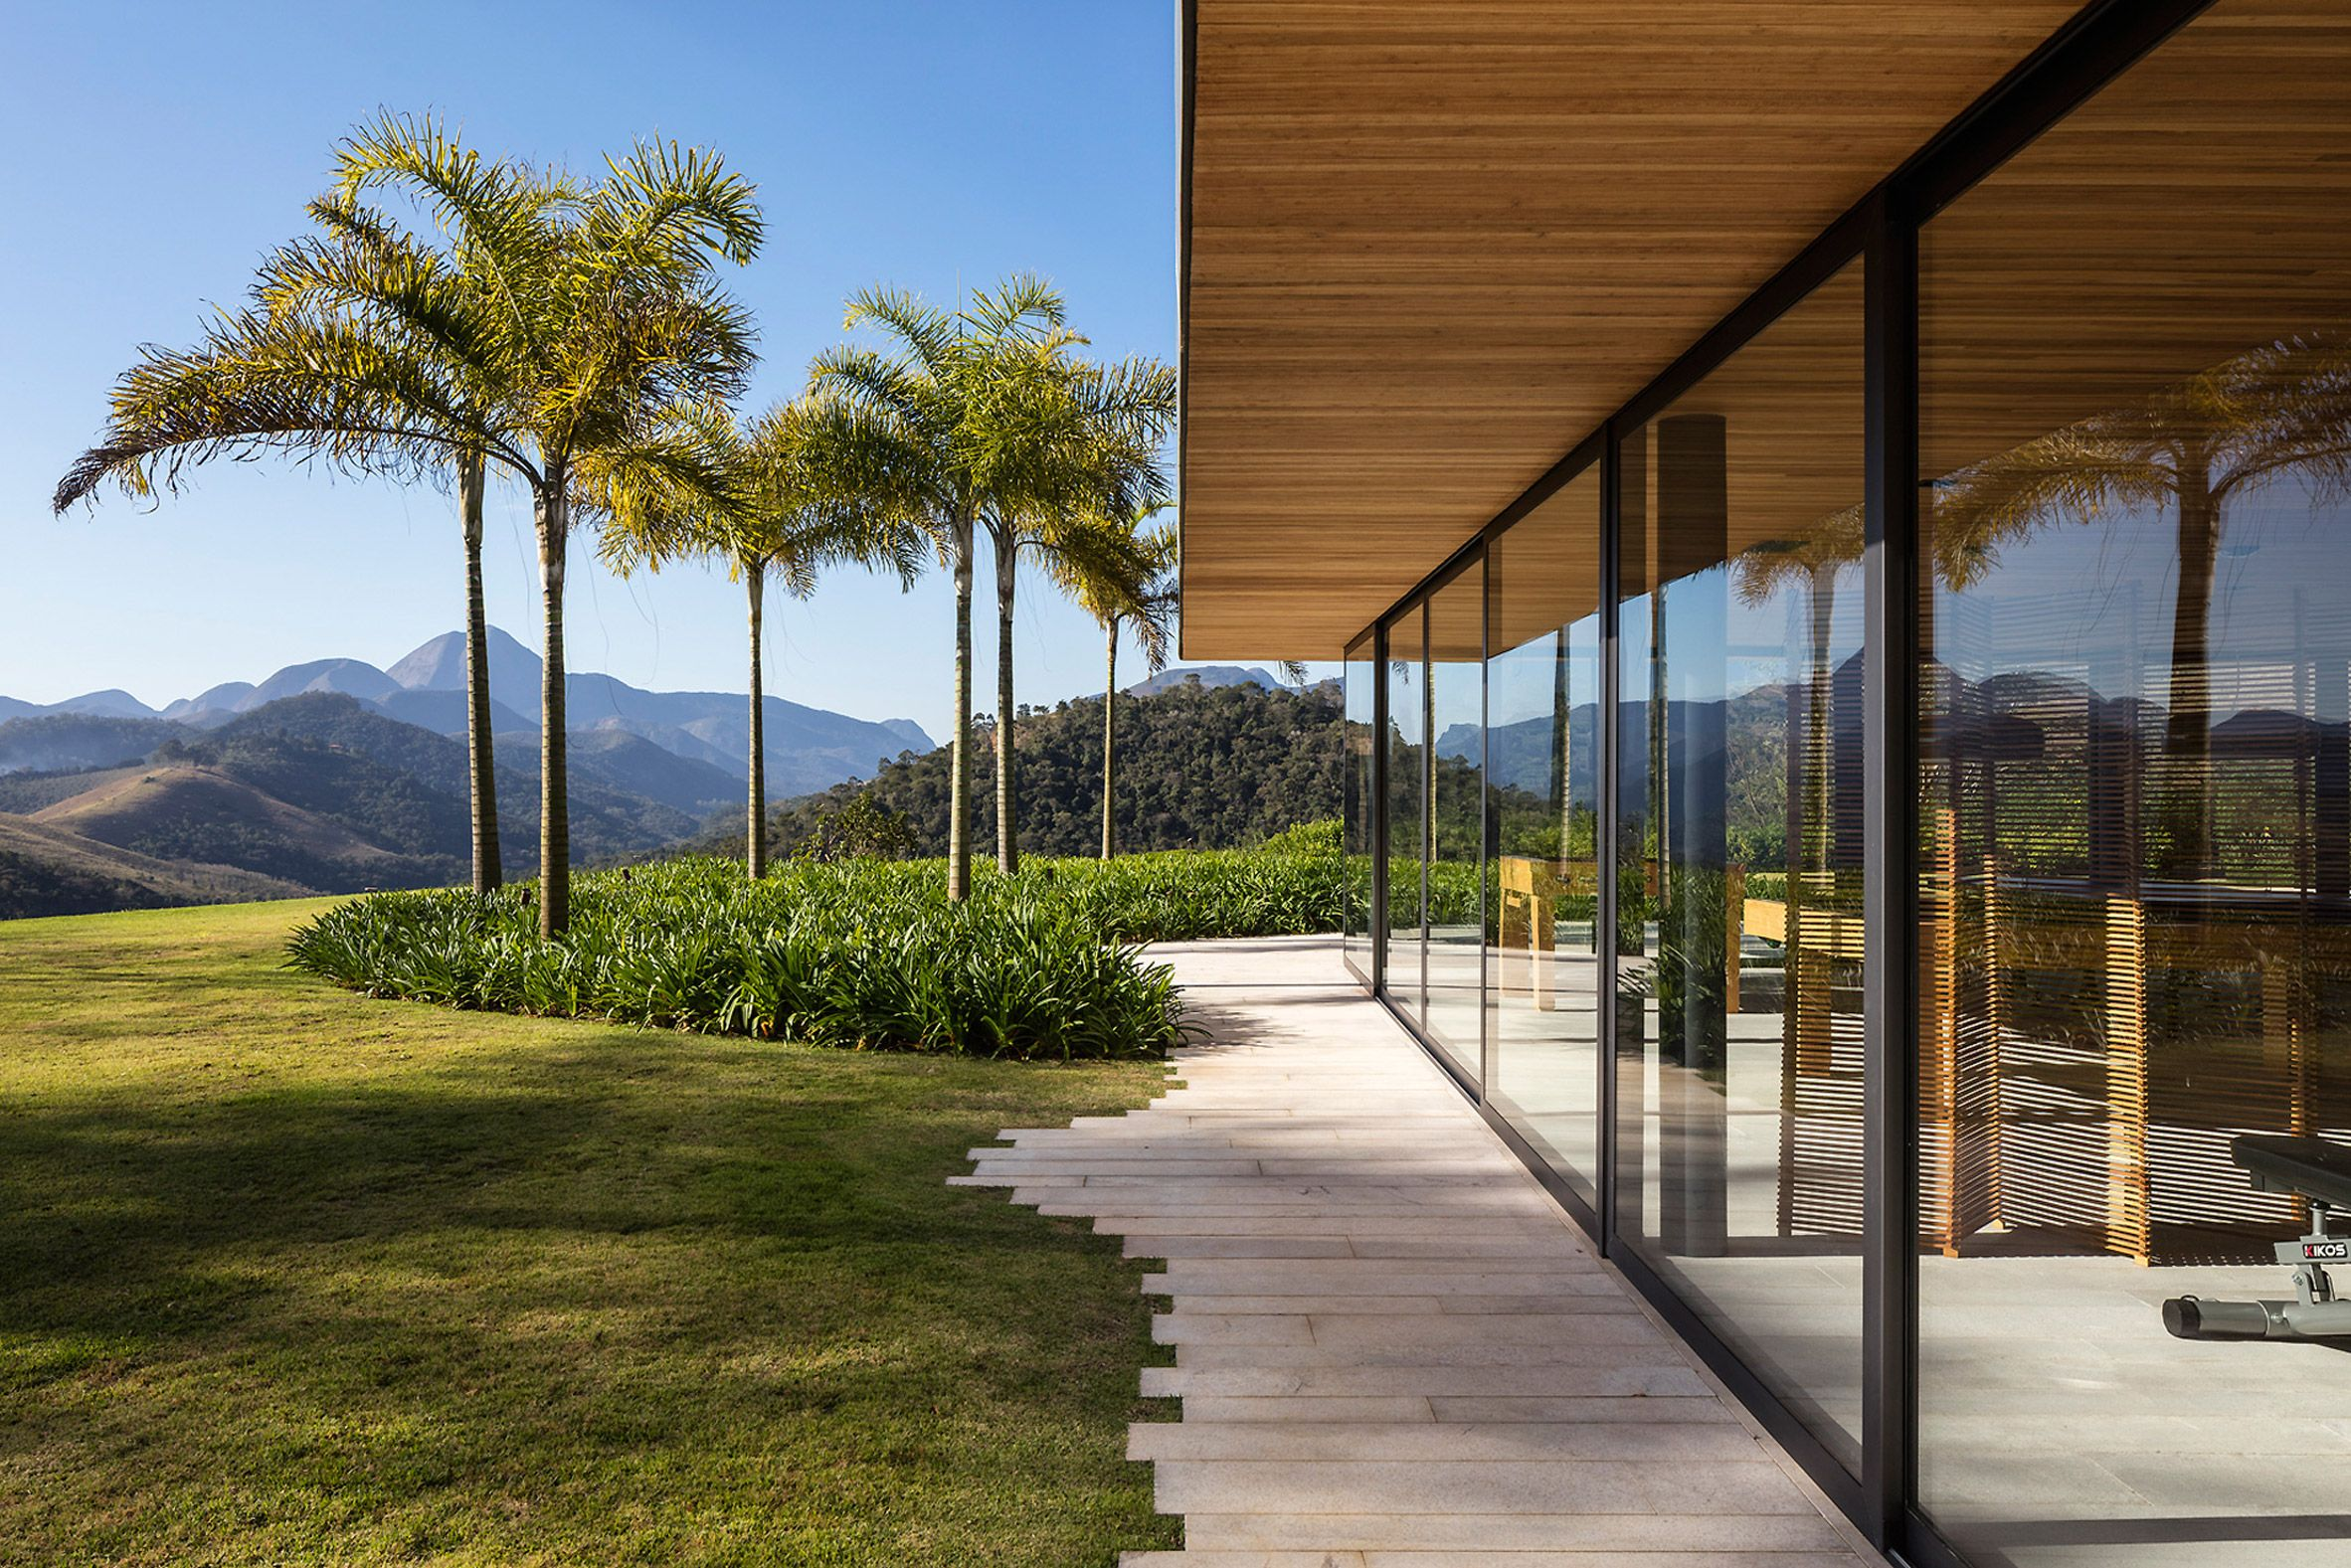 Httpswwwdezeencom20170629Bernardes Arquiteturas Casa Terra Concrete Walls Colour Brazil Architecture